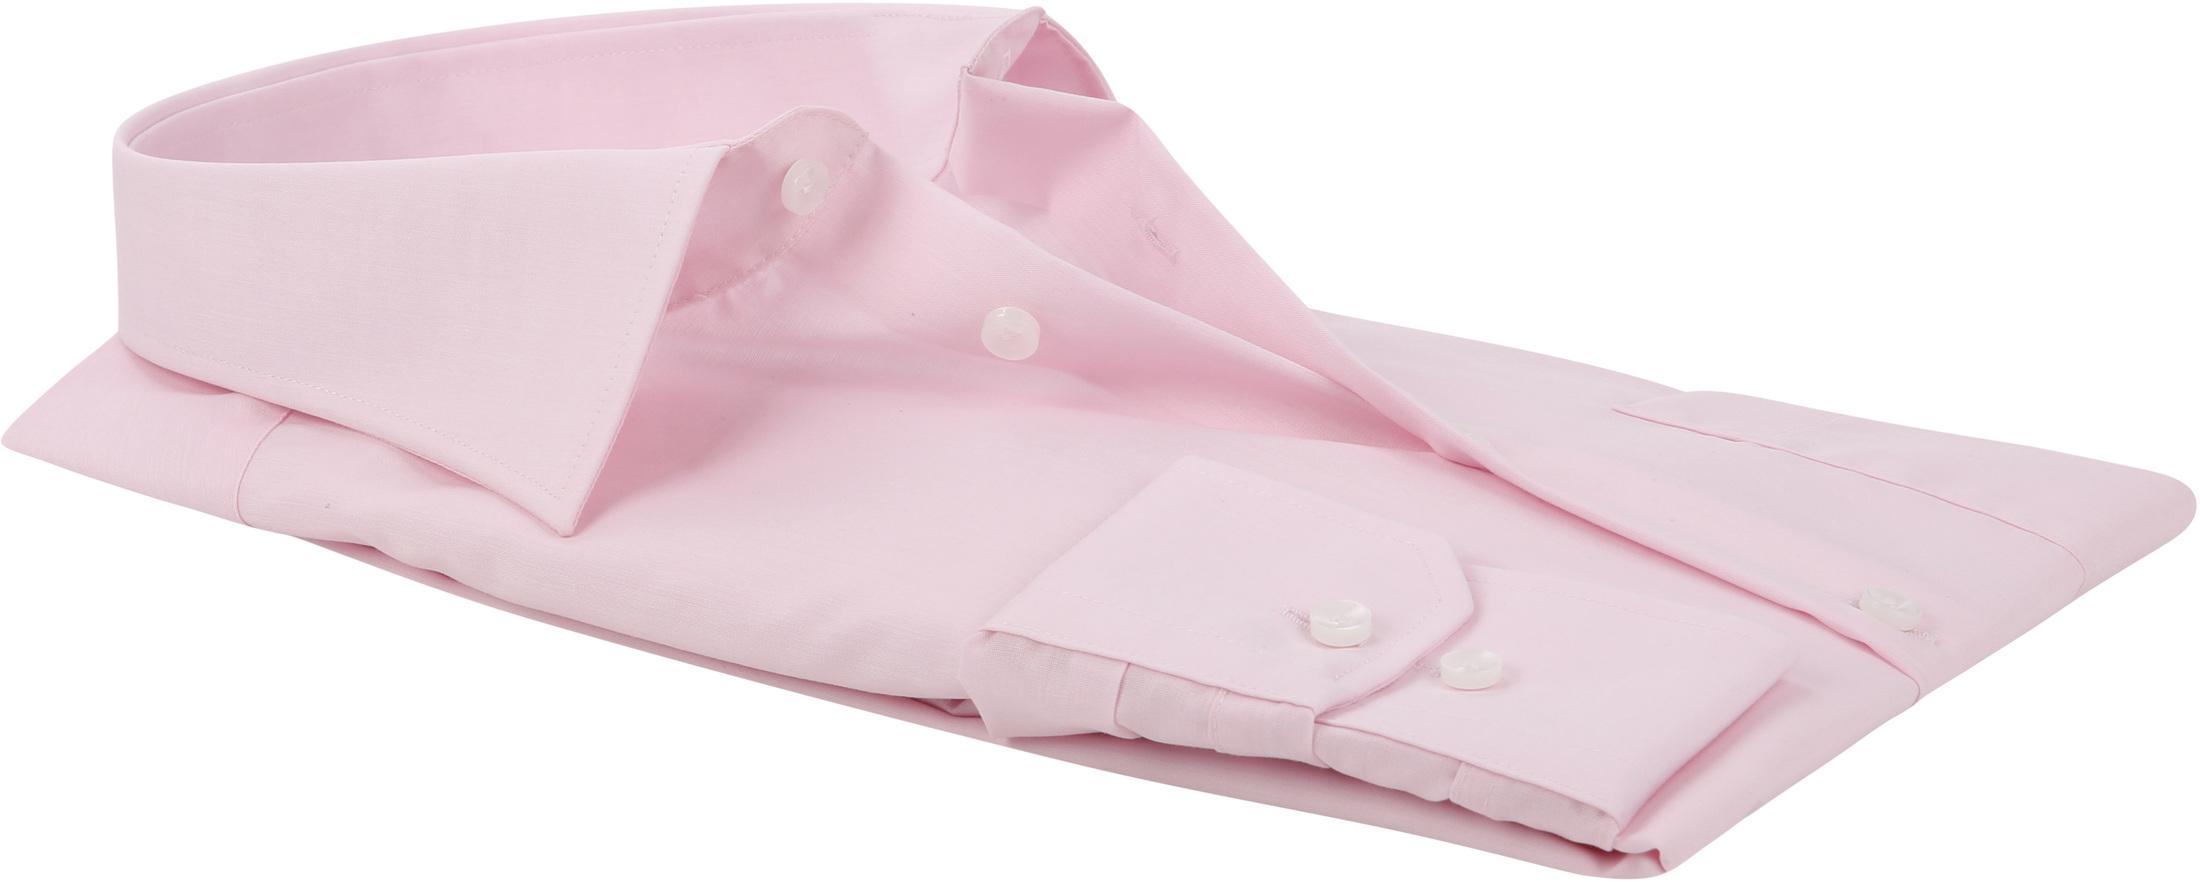 Seidensticker Splendesto Shirt Roze photo 3